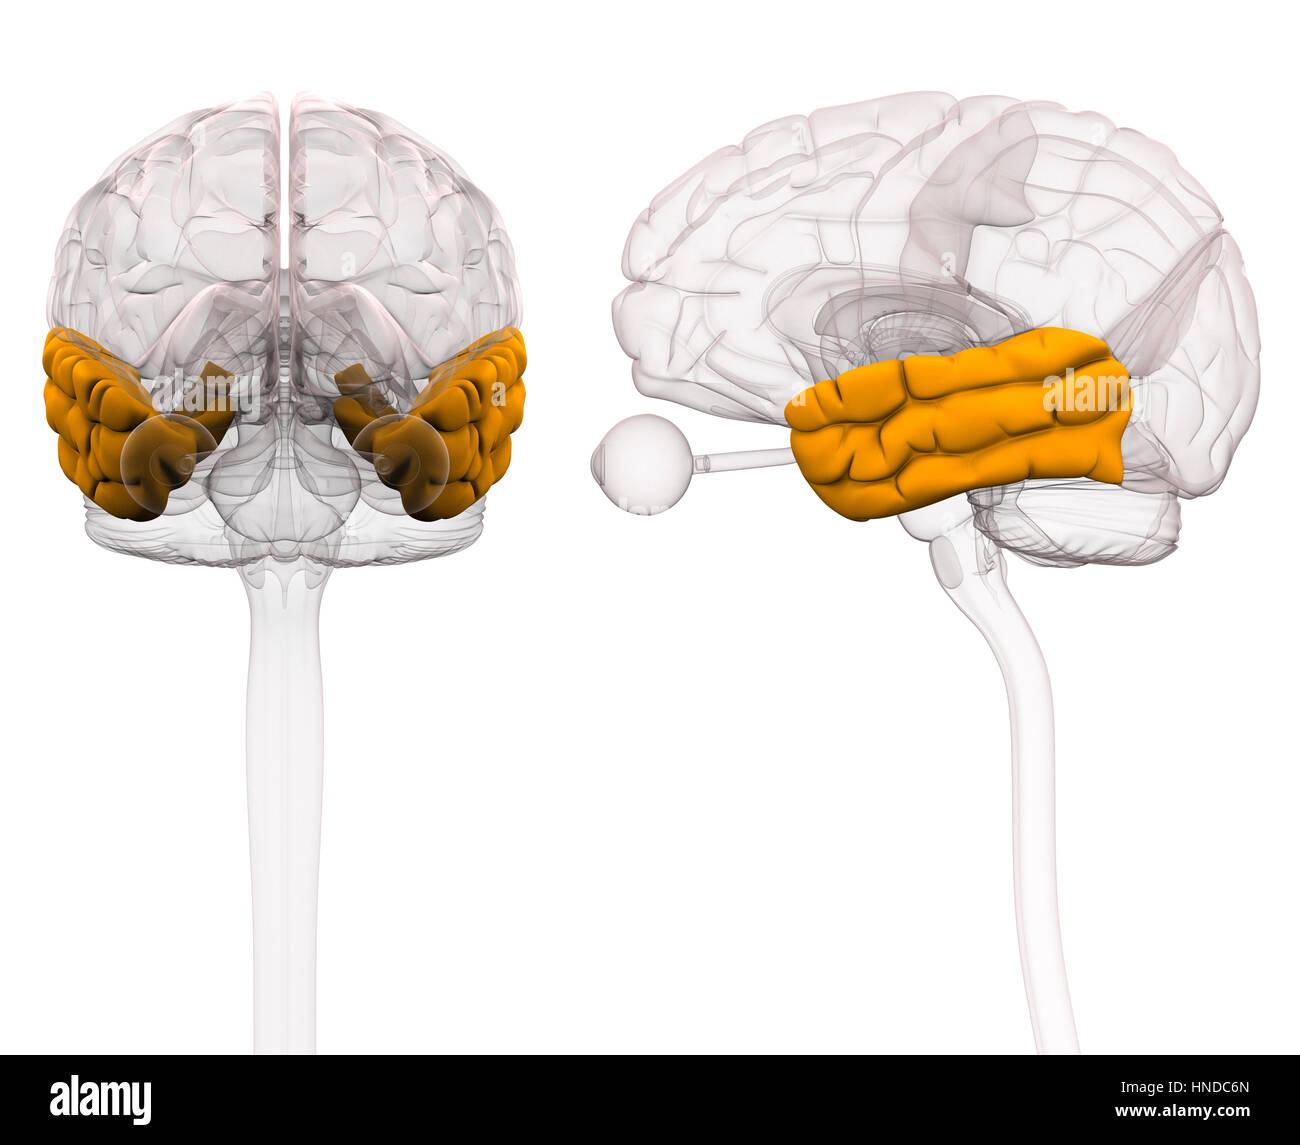 Amygdala Imágenes De Stock & Amygdala Fotos De Stock - Alamy